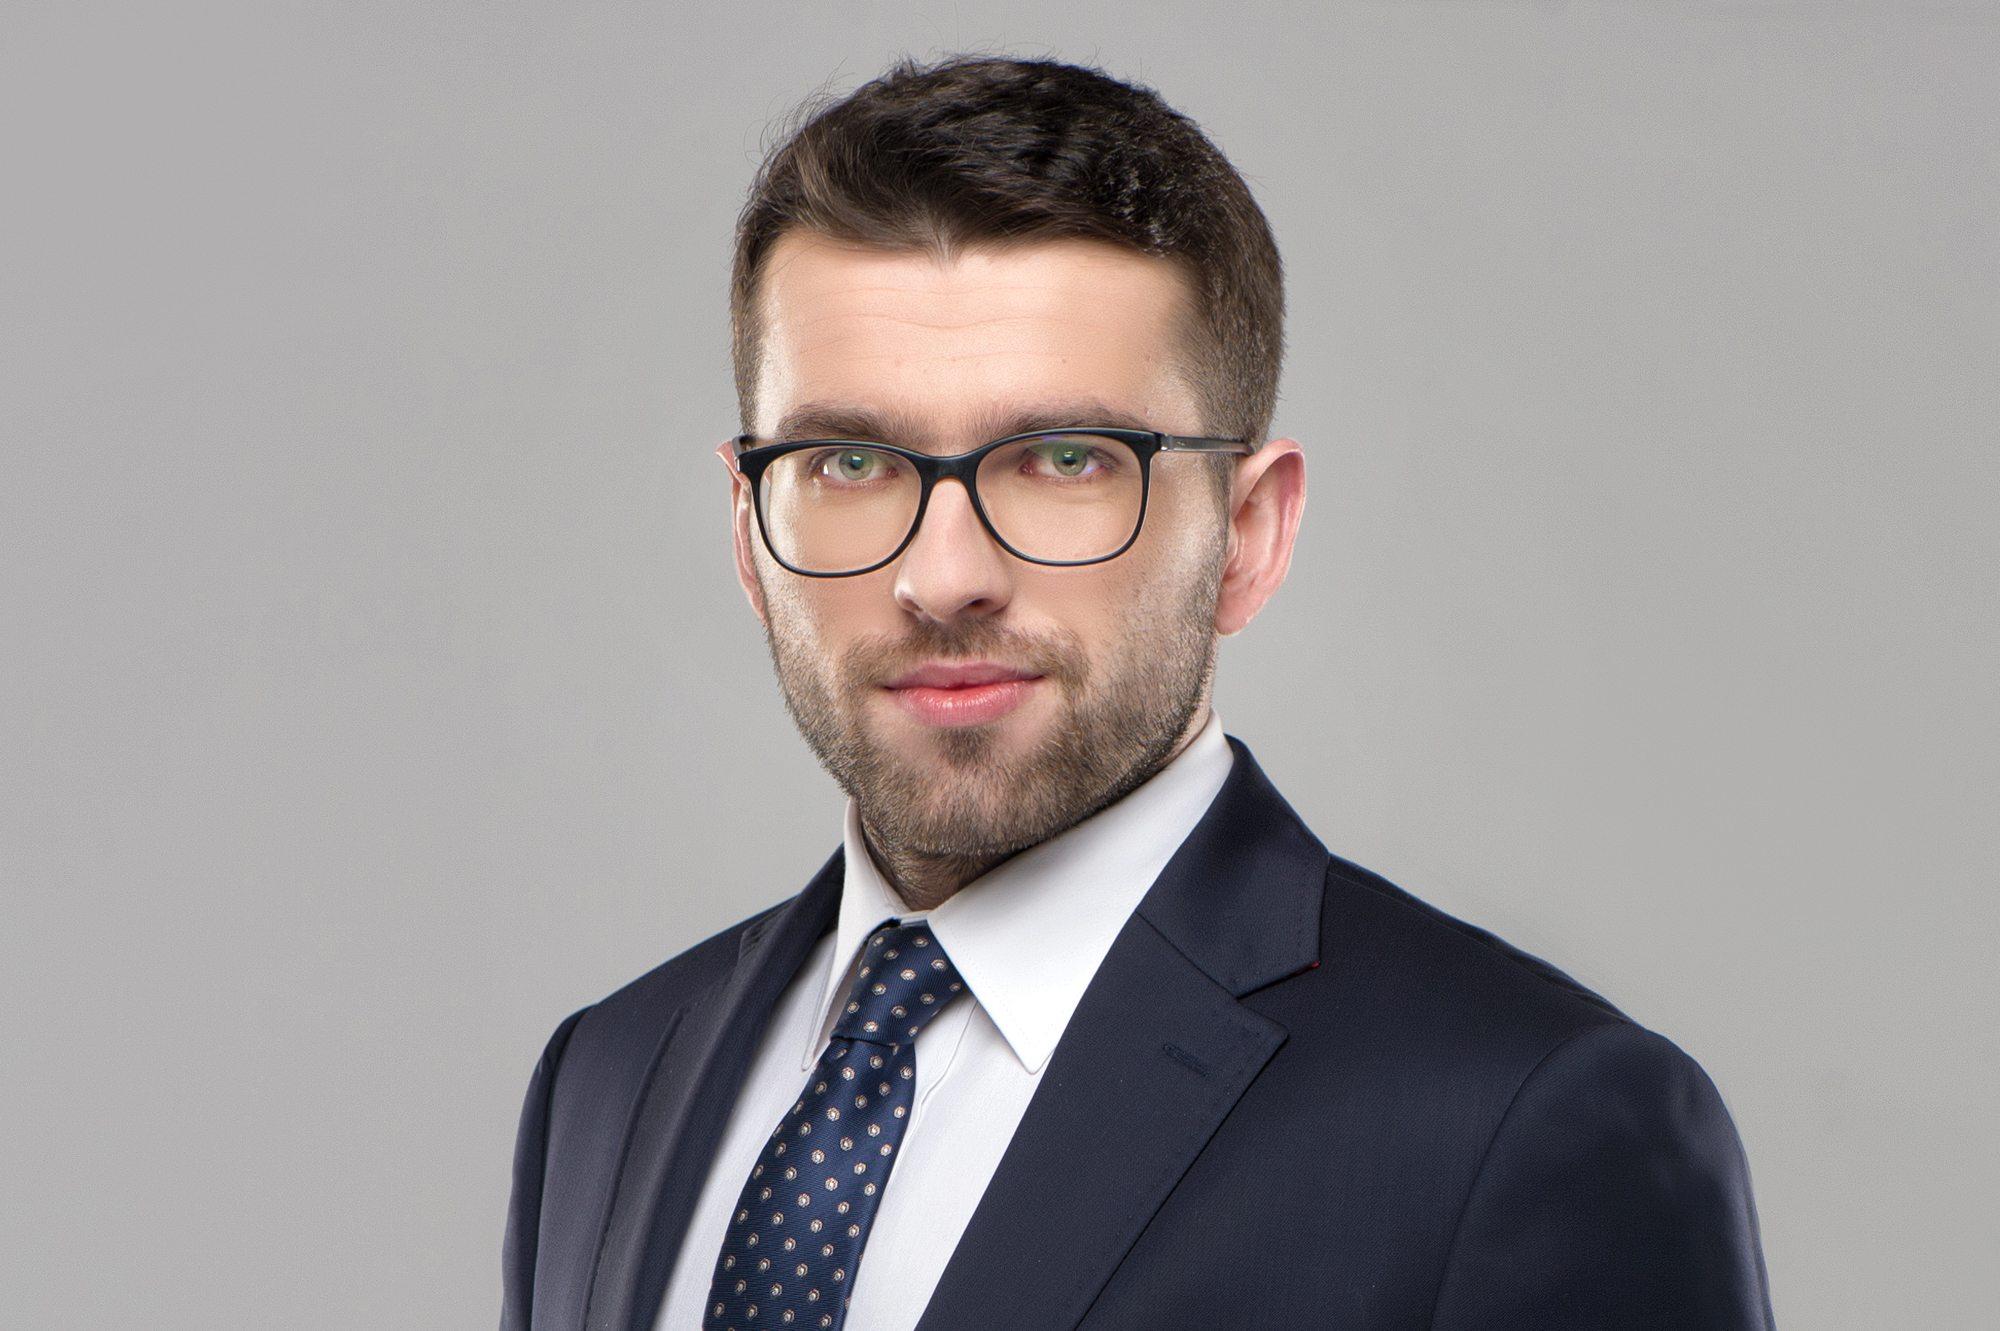 Jakub Polak